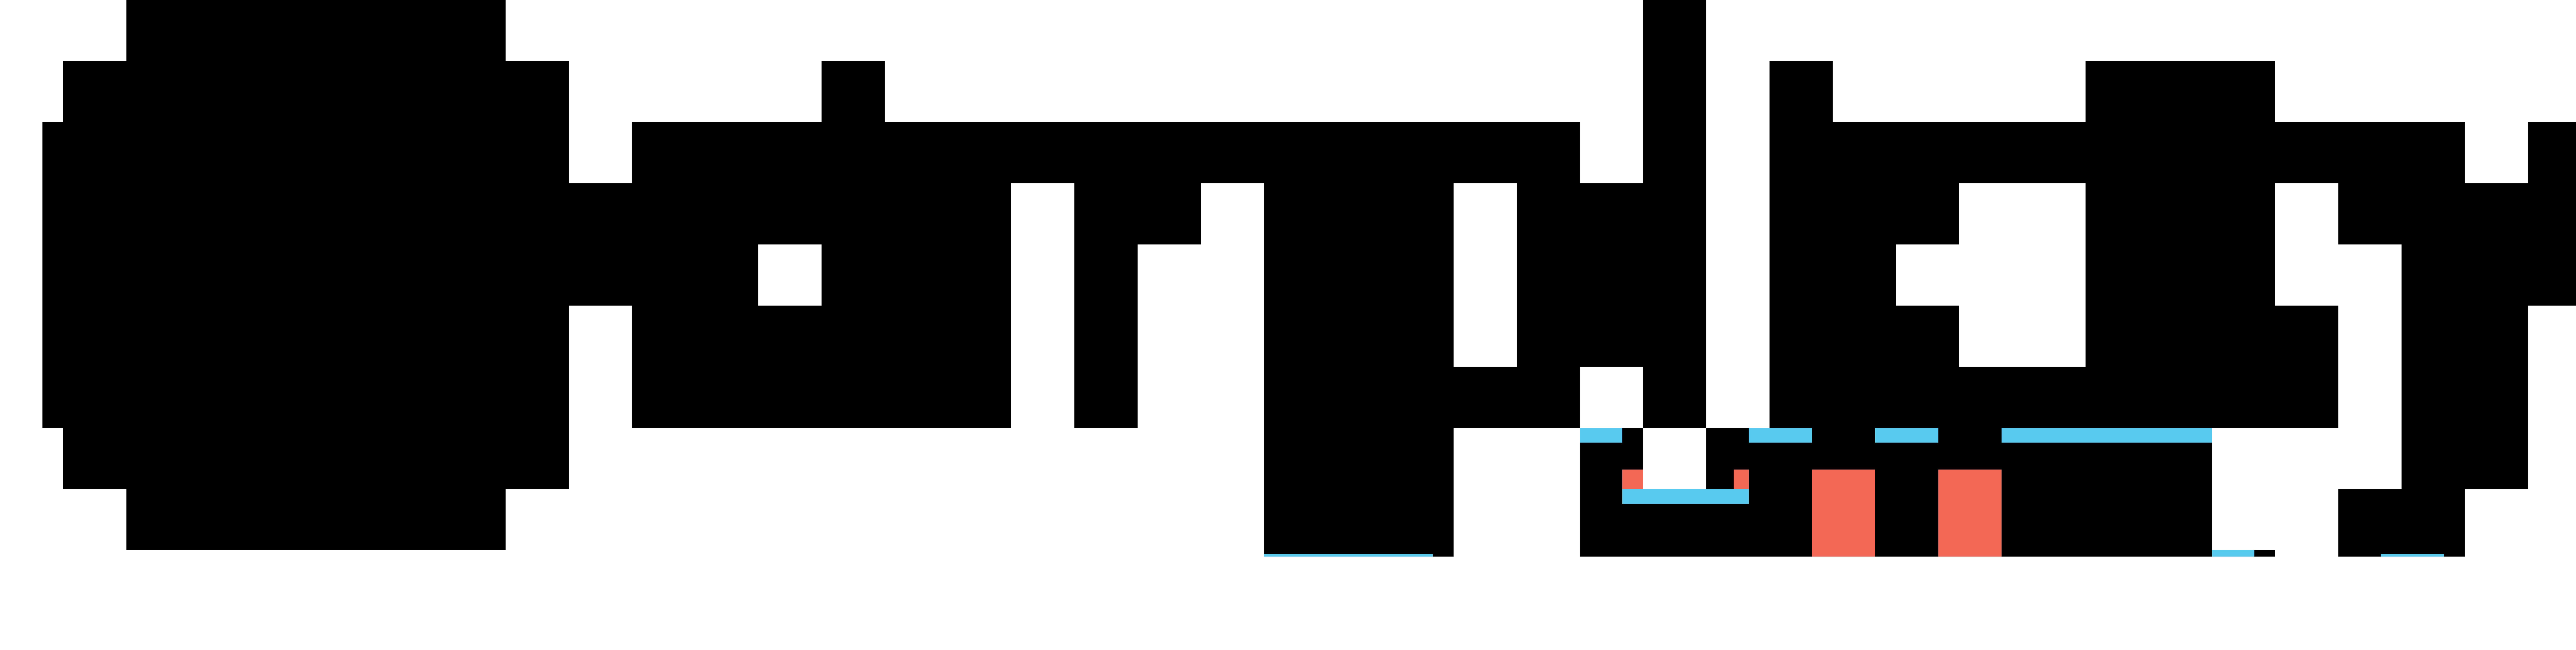 Simplicity Laser Company Logo